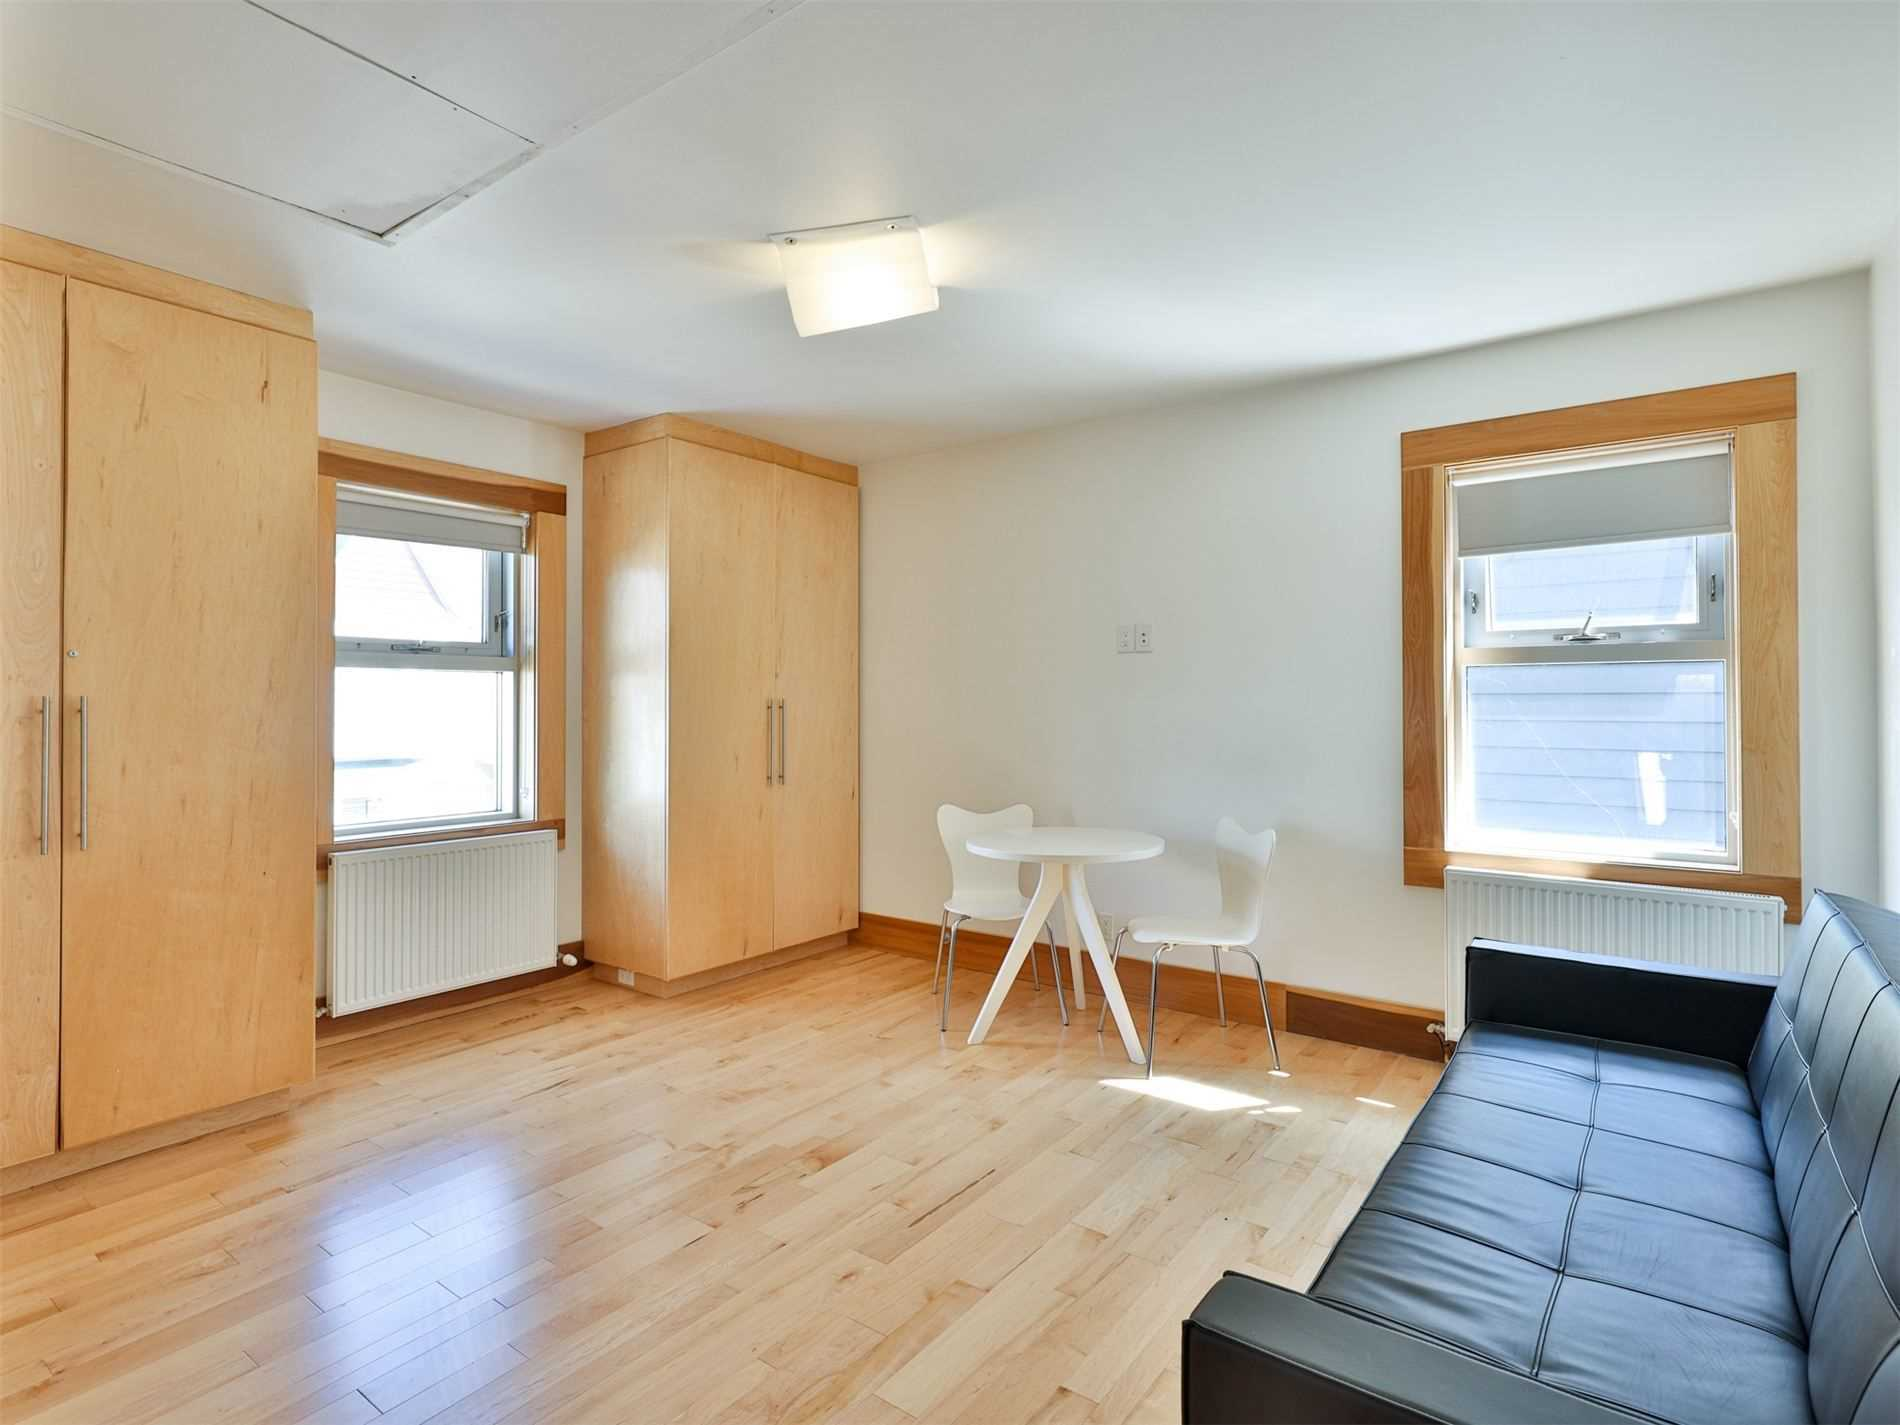 118 Claremont St, Toronto, Ontario M6J2M5, 6 Bedrooms Bedrooms, 19 Rooms Rooms,6 BathroomsBathrooms,Detached,For Sale,Claremont,C5368935